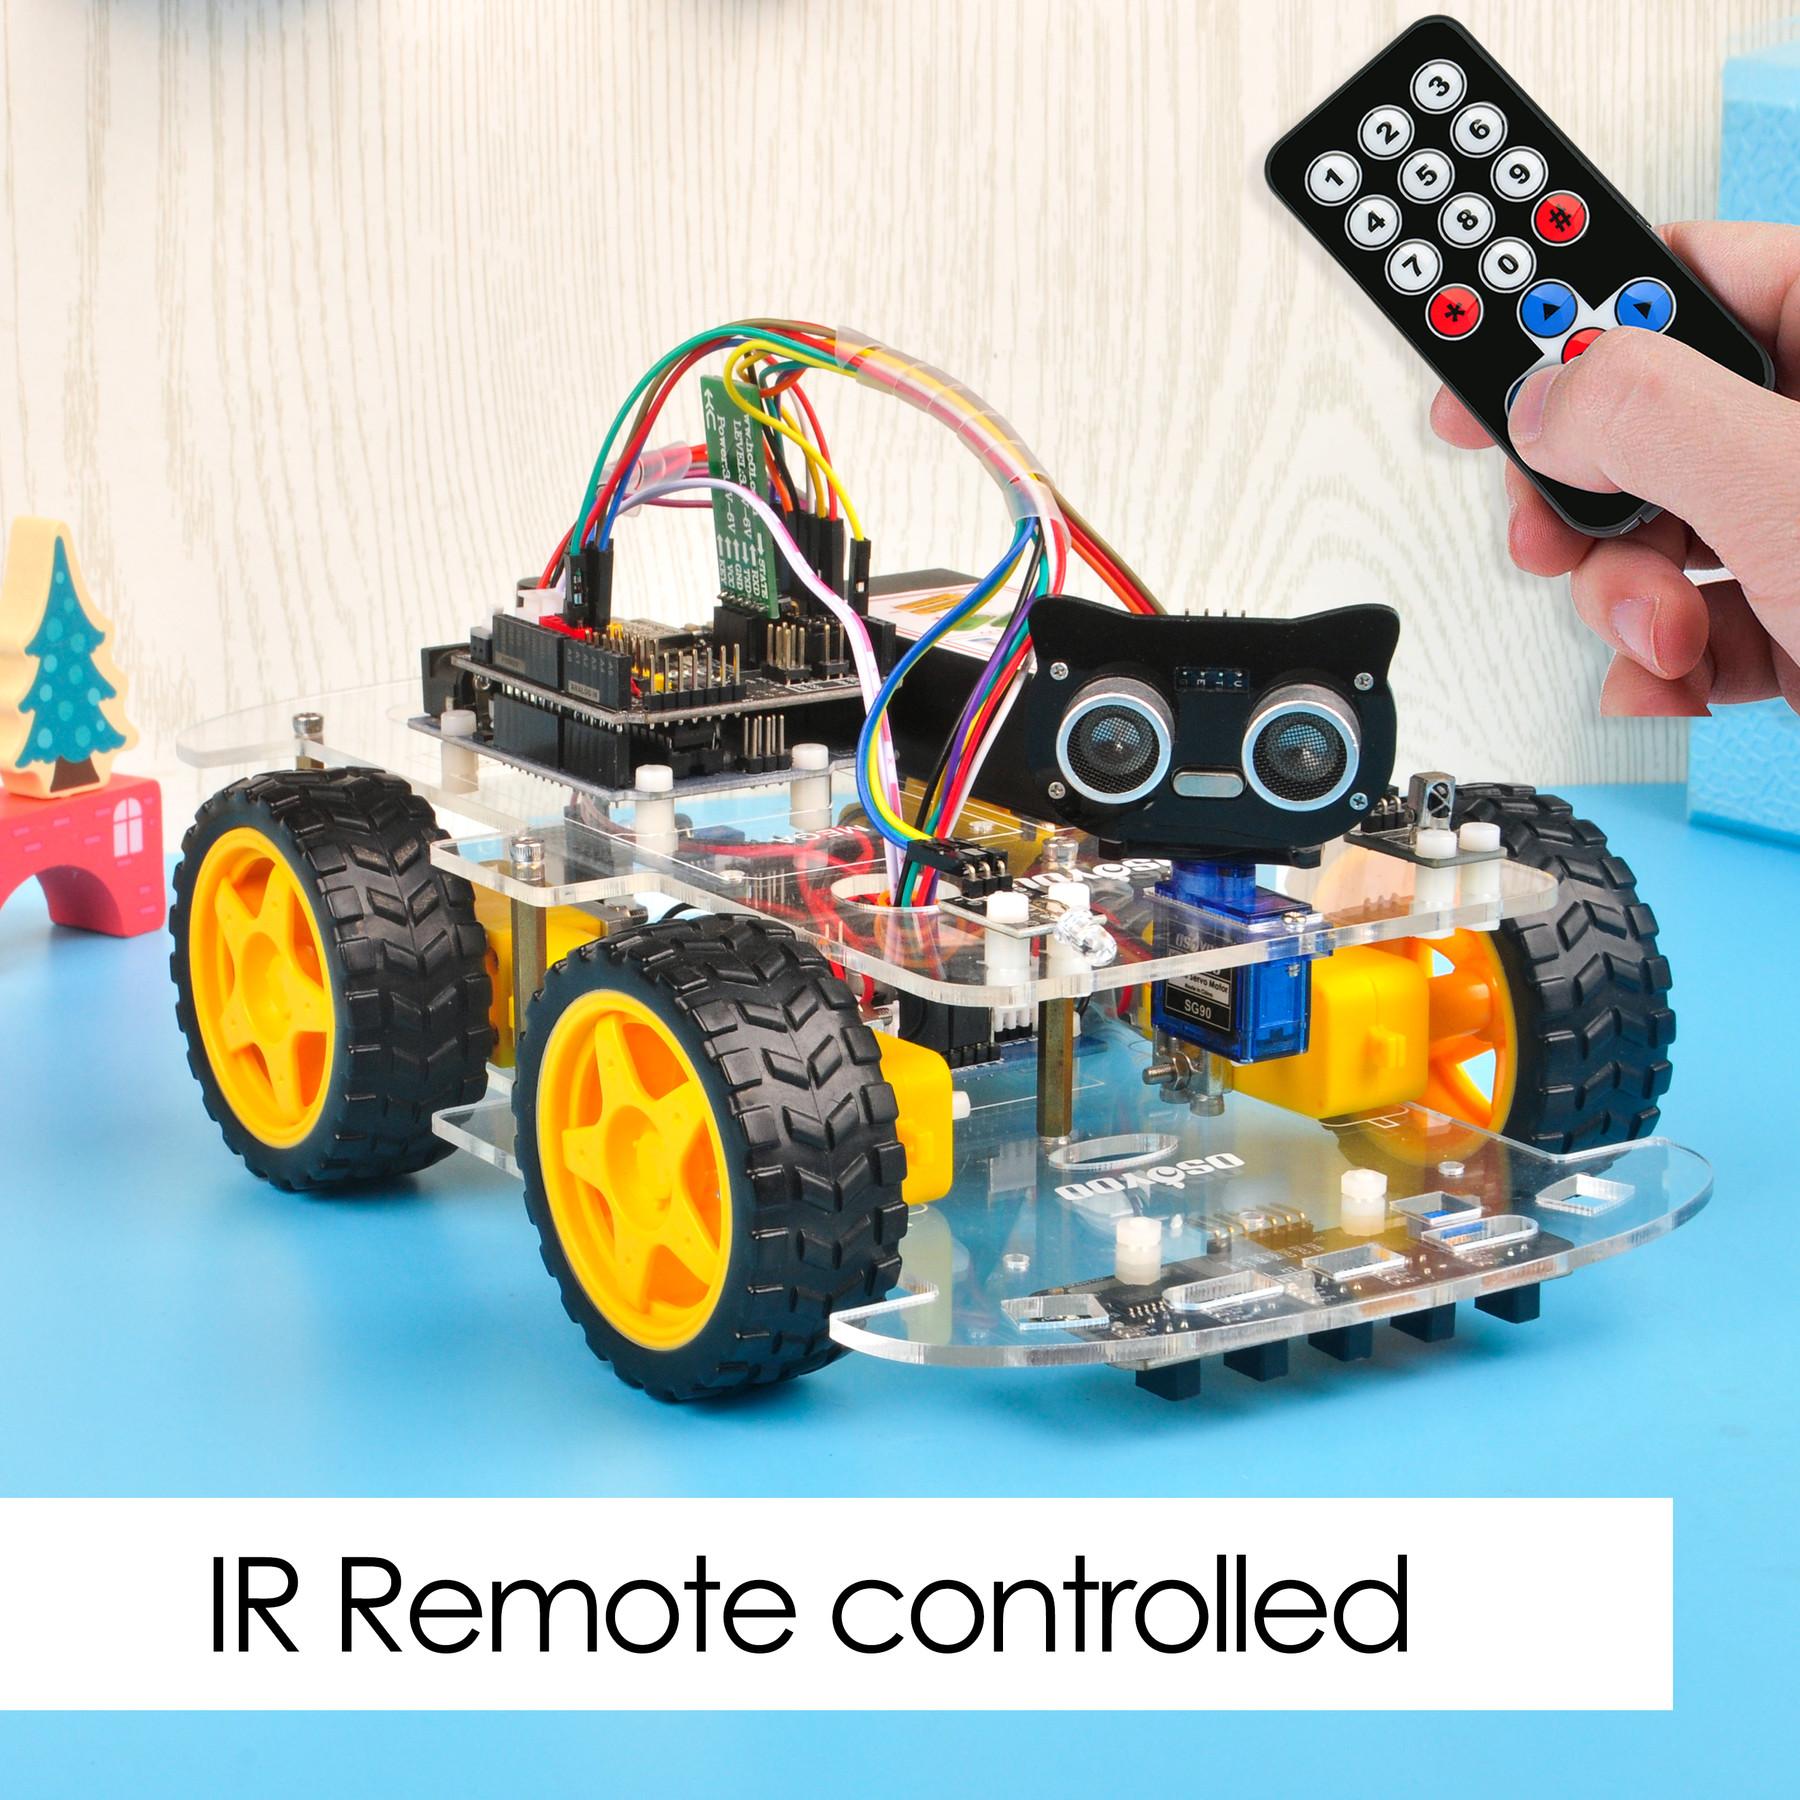 OSOYOO V2.1 Robot car kit Lesson 2: IR Remote Control Robot Car